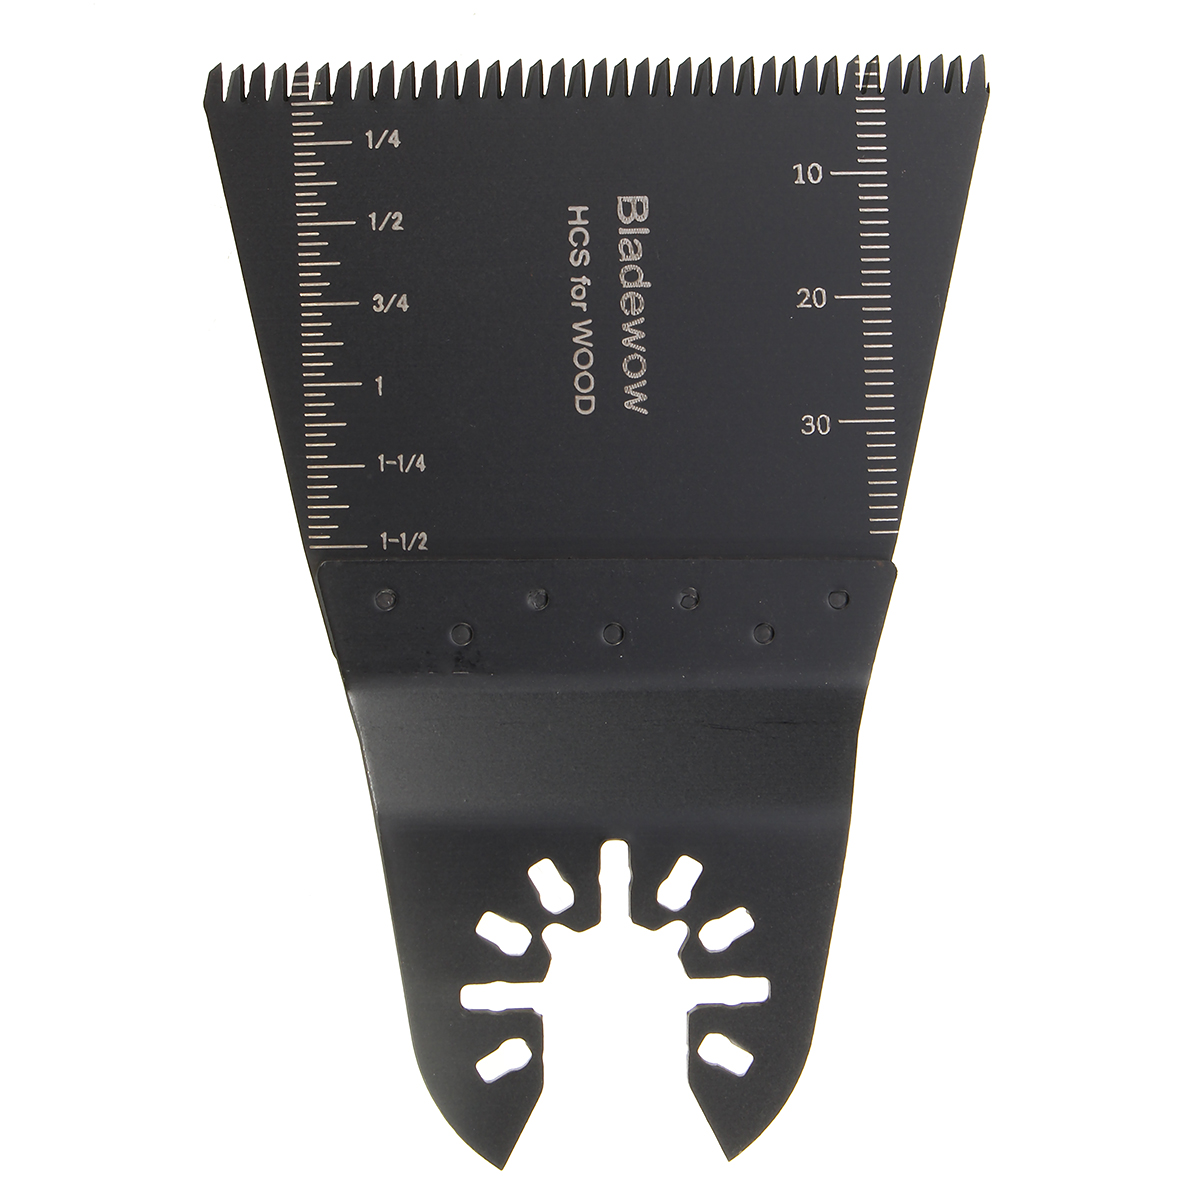 68pcs Oscillating Multi Tool Saw Blades Kit for Fein Makita Bosch Milwaukee Multitool